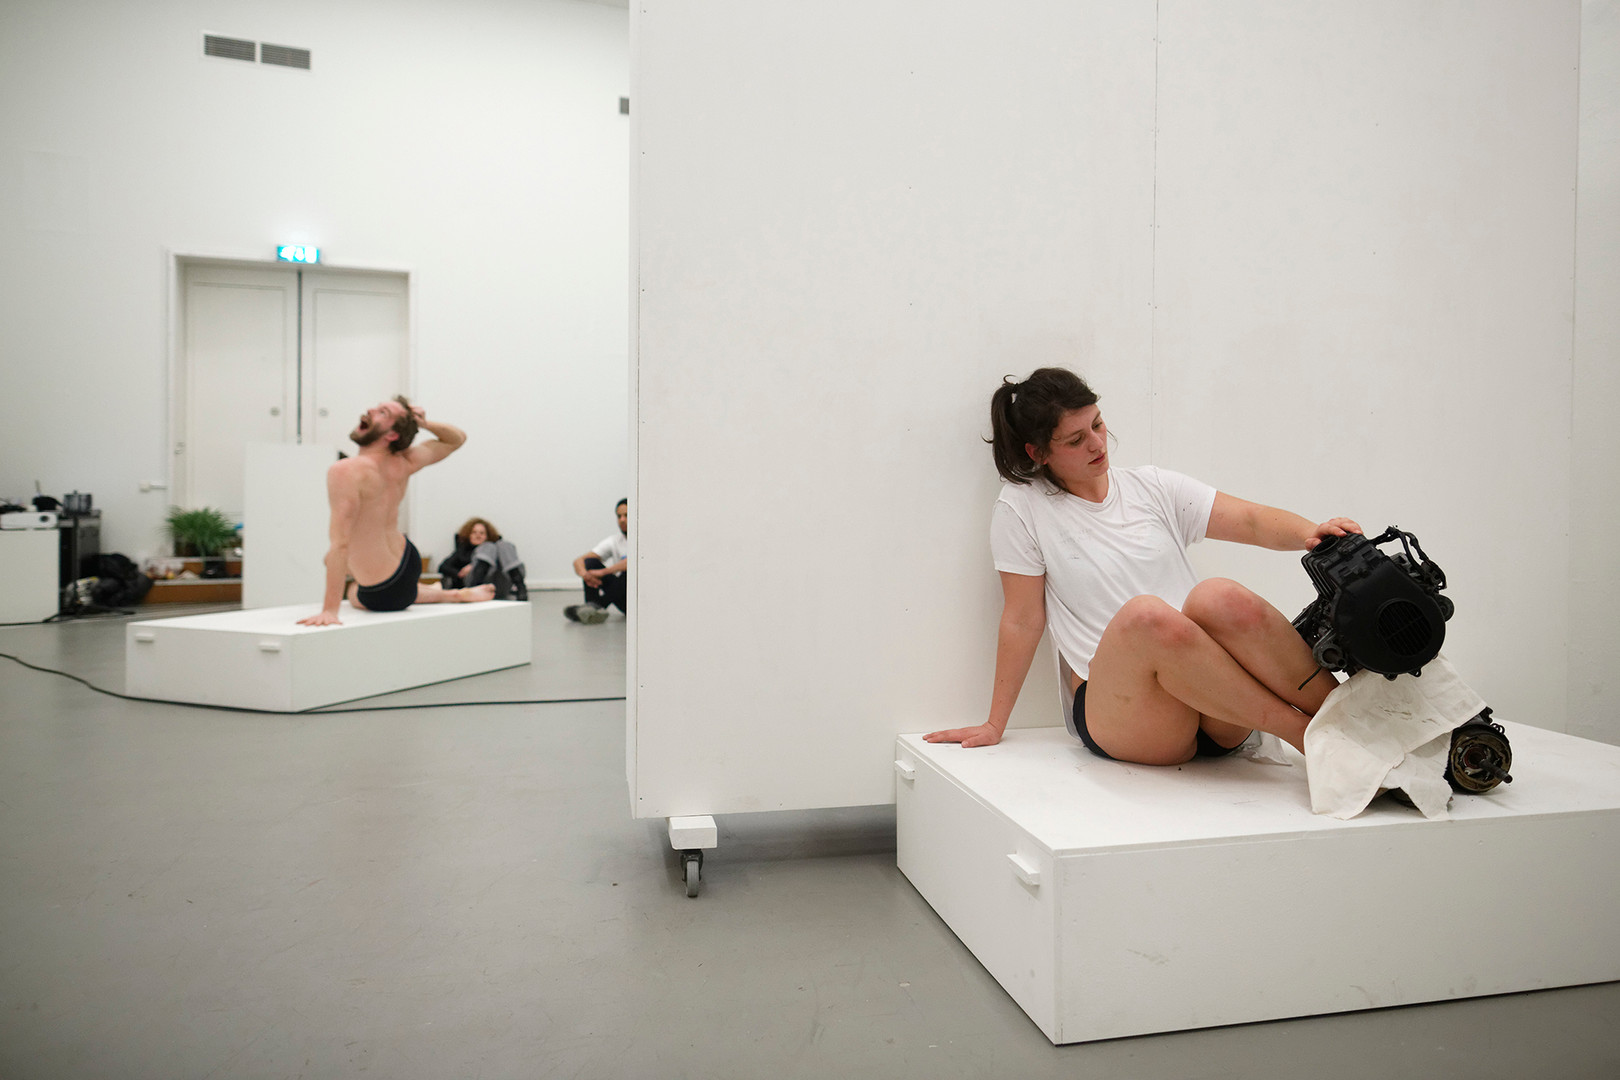 FaustRaum, Franziska Menge & Hendrik Walther, photos by Thomas Lenden